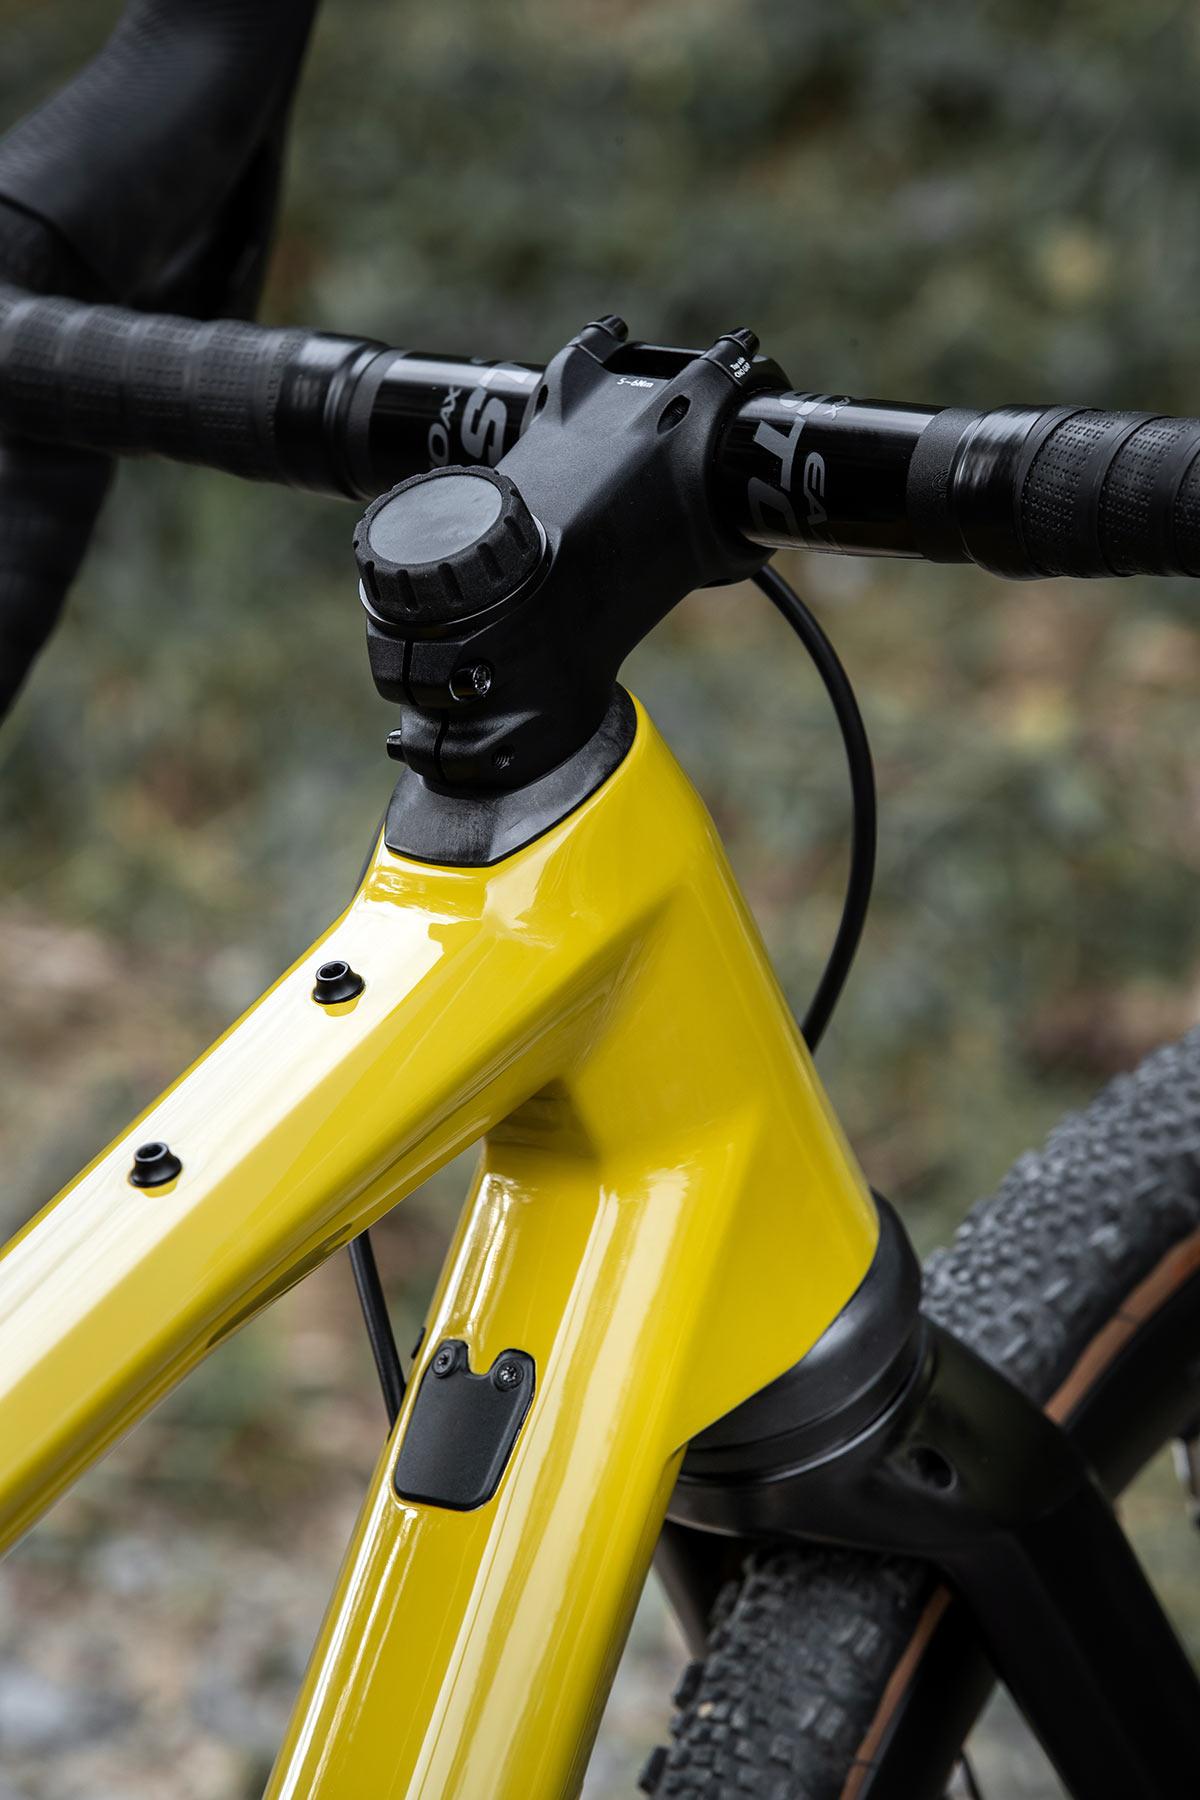 bmc urs lt full suspension gravel bike closeup on fork lockout and top tube mounts